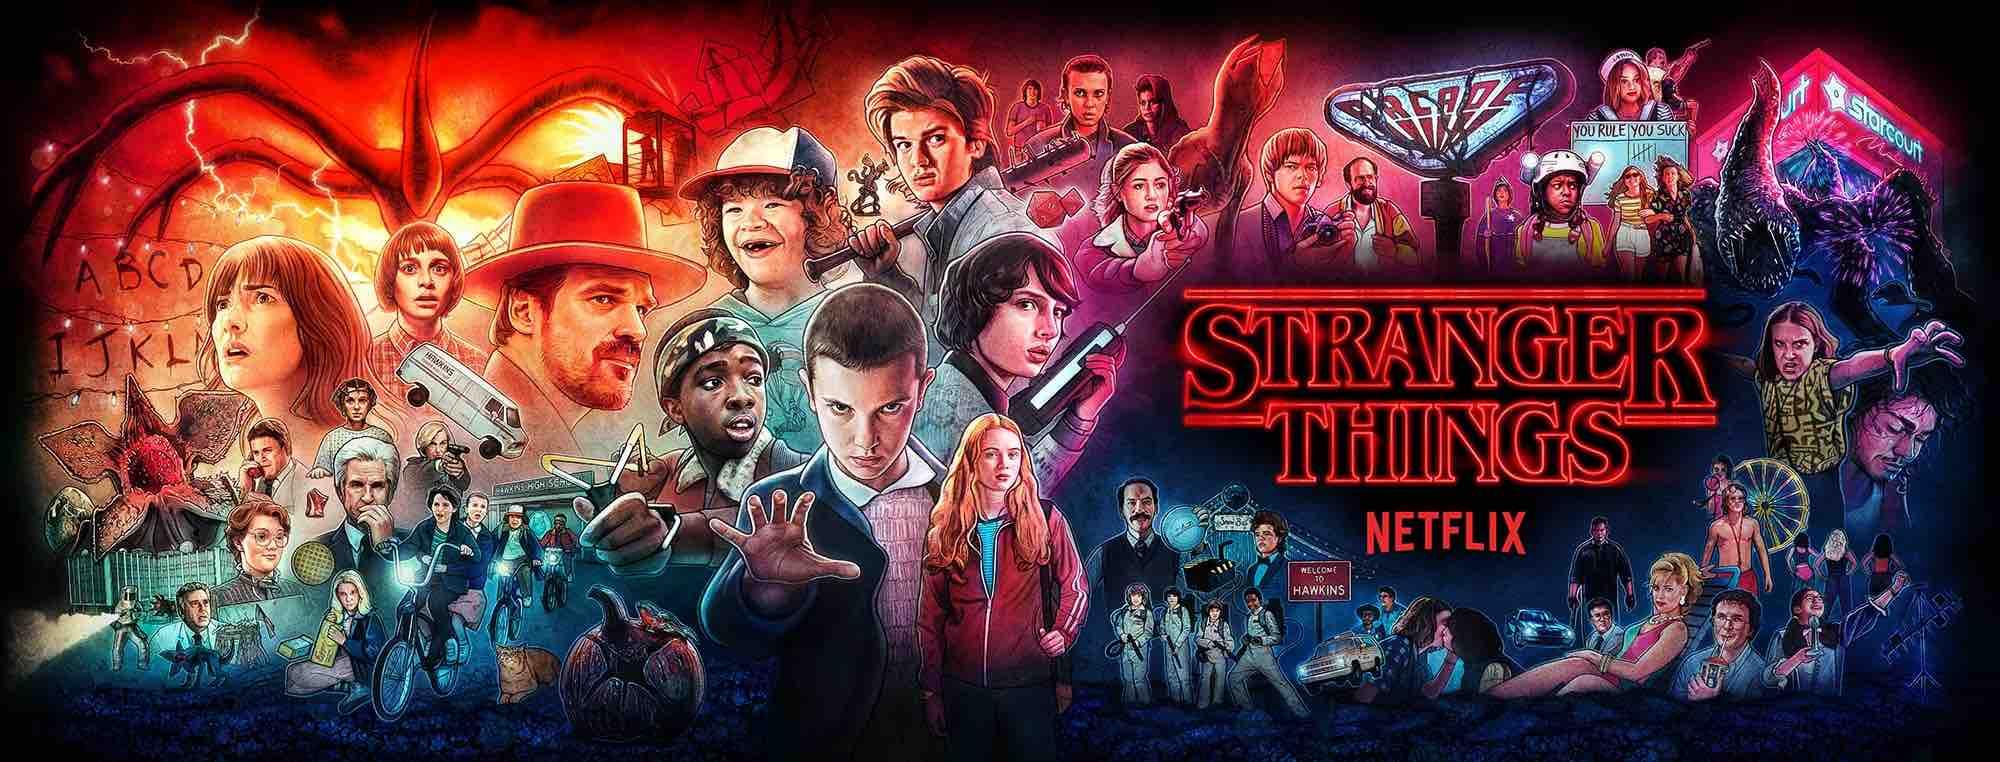 Stranger Things Netflix série